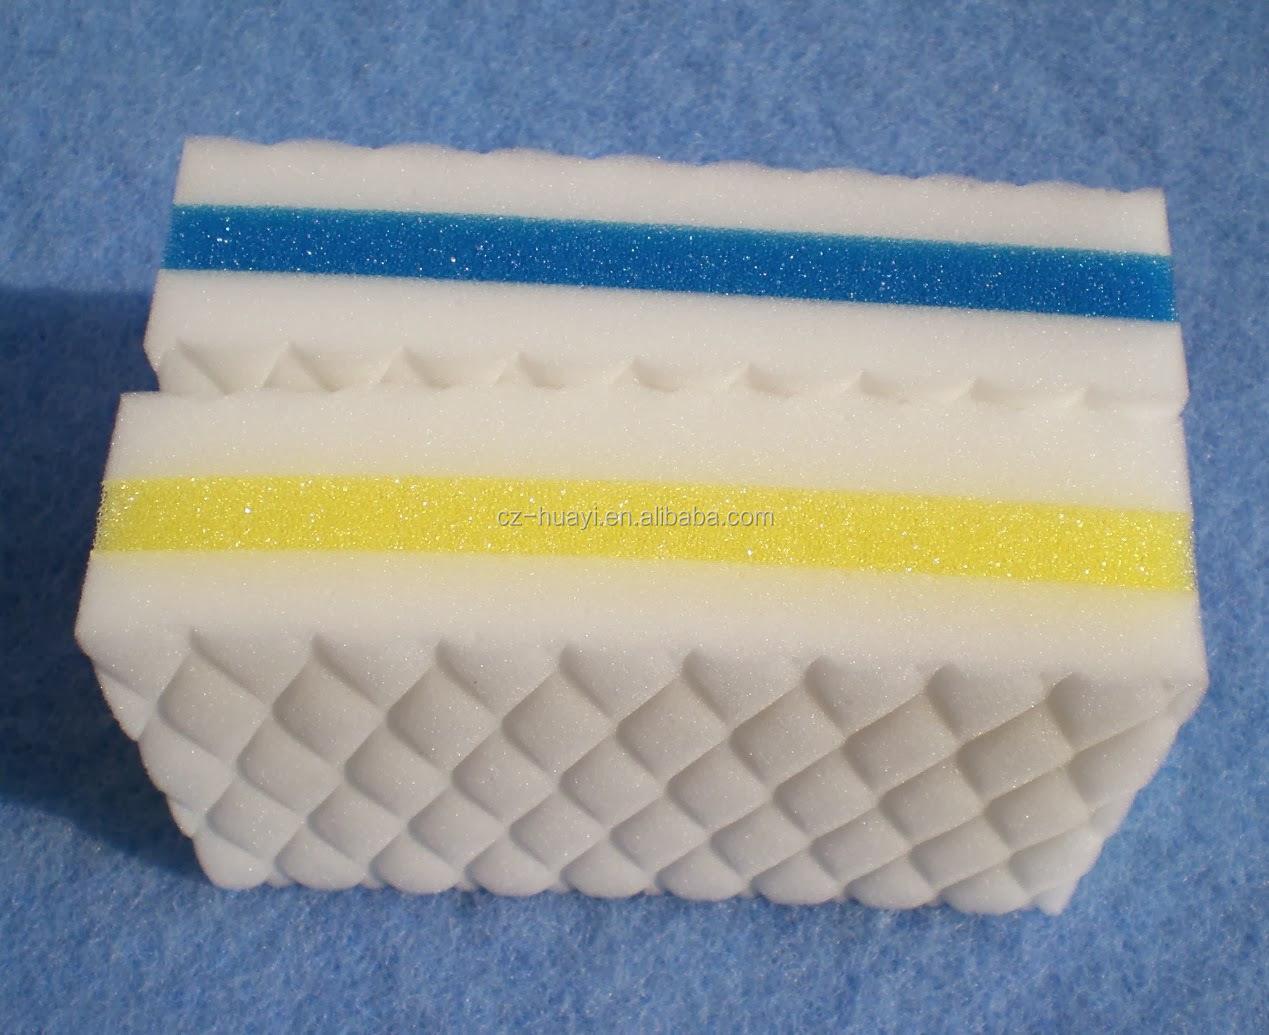 Polyurethane Foam Sheets Polyurethane Melamine Foam